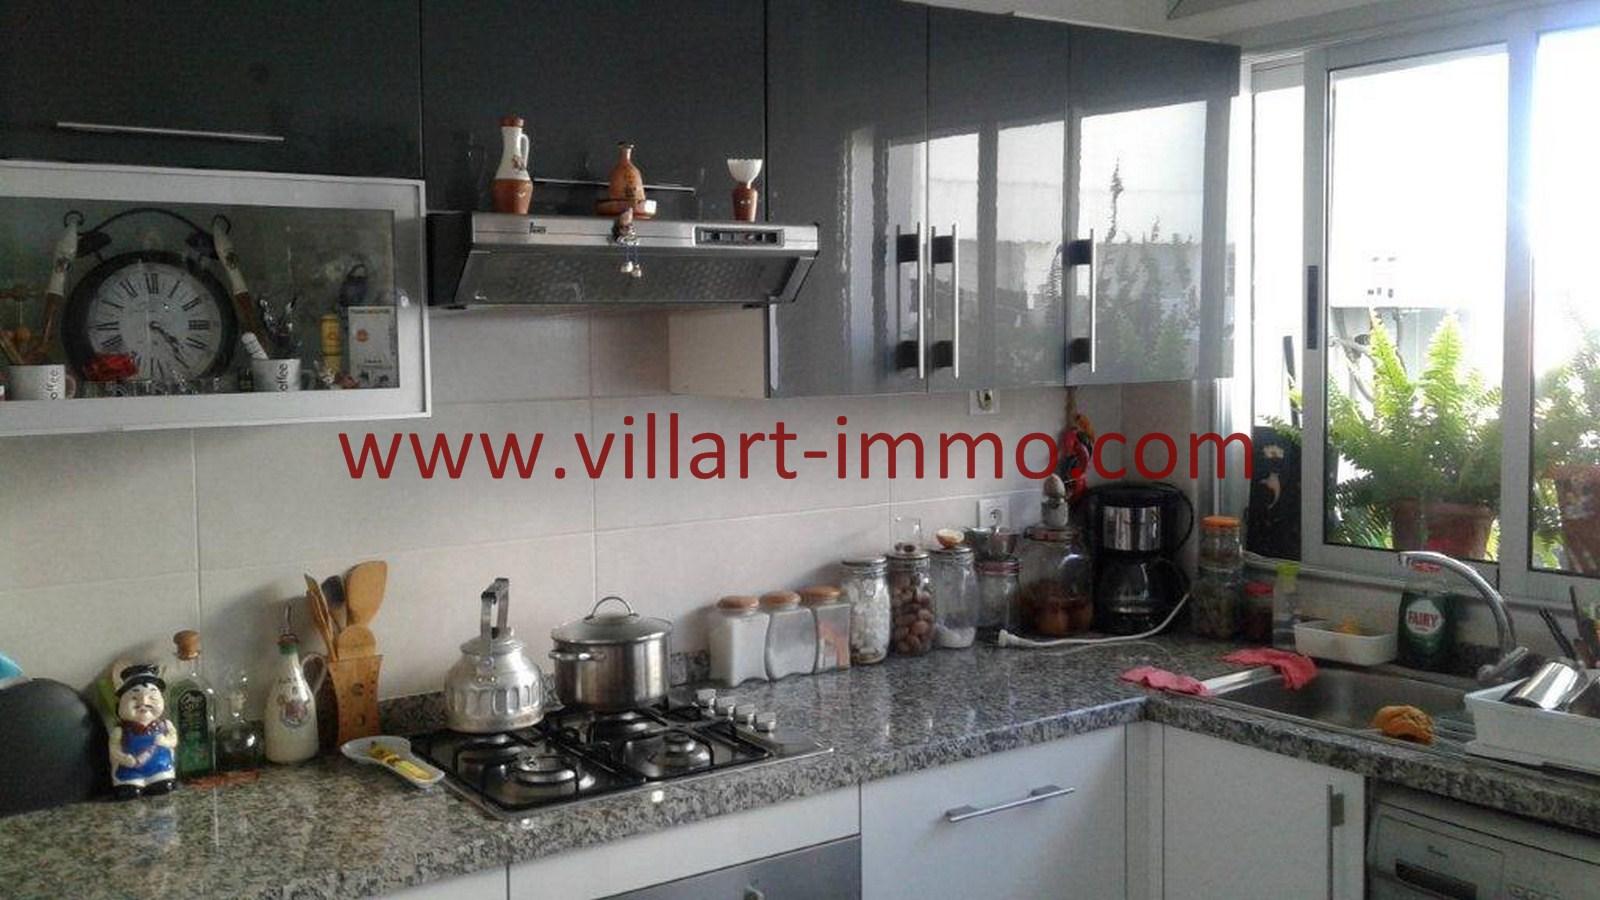 6-A vendre-Appartement-Tanger-Castilla-Cuisine-VA473-Villart immo-Agence Immobilière